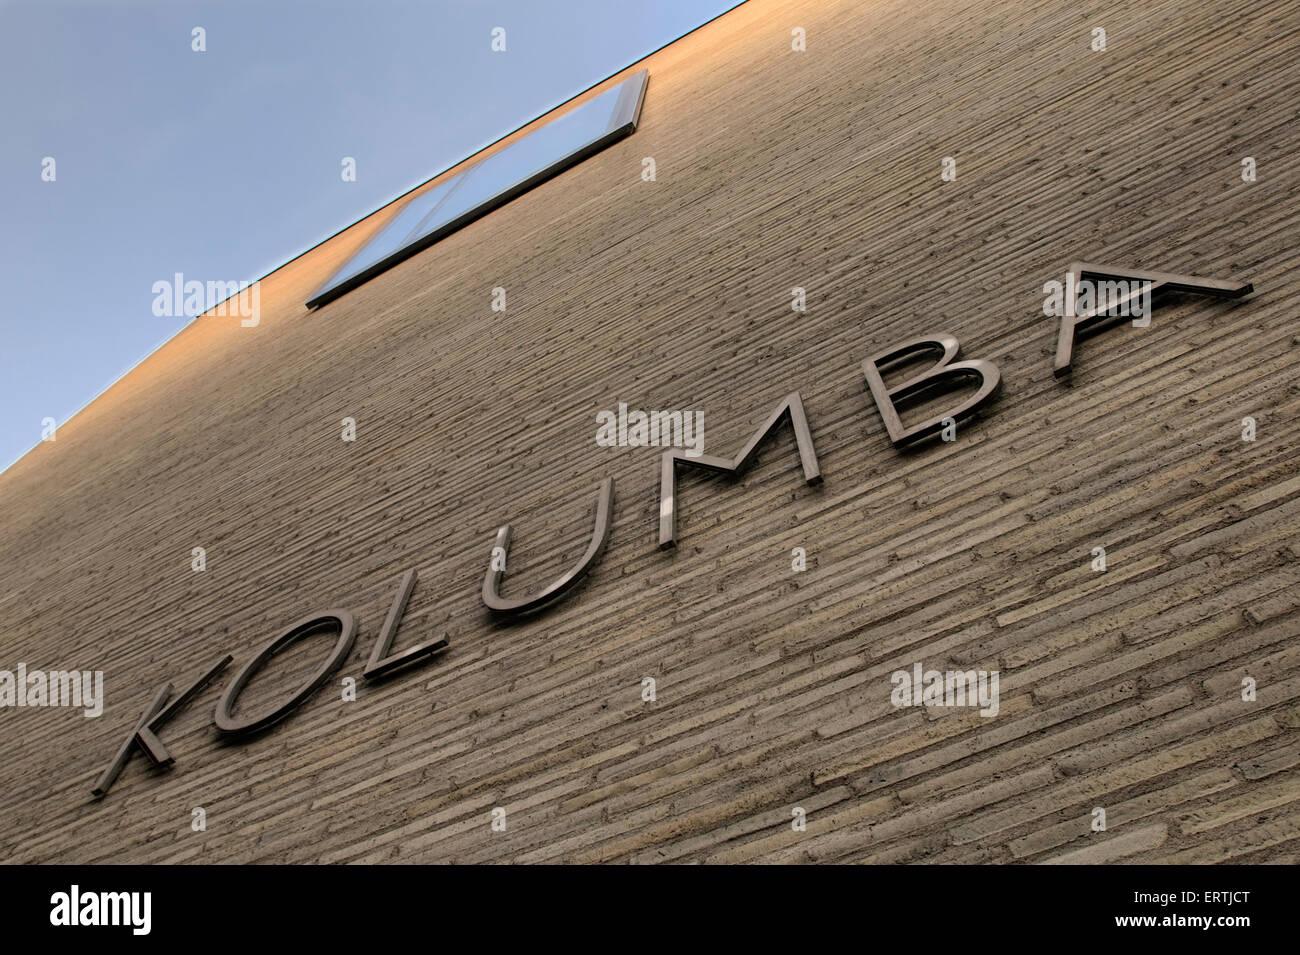 Kolumba diocese museum of the cologne catholic church germany europe Stock Photo